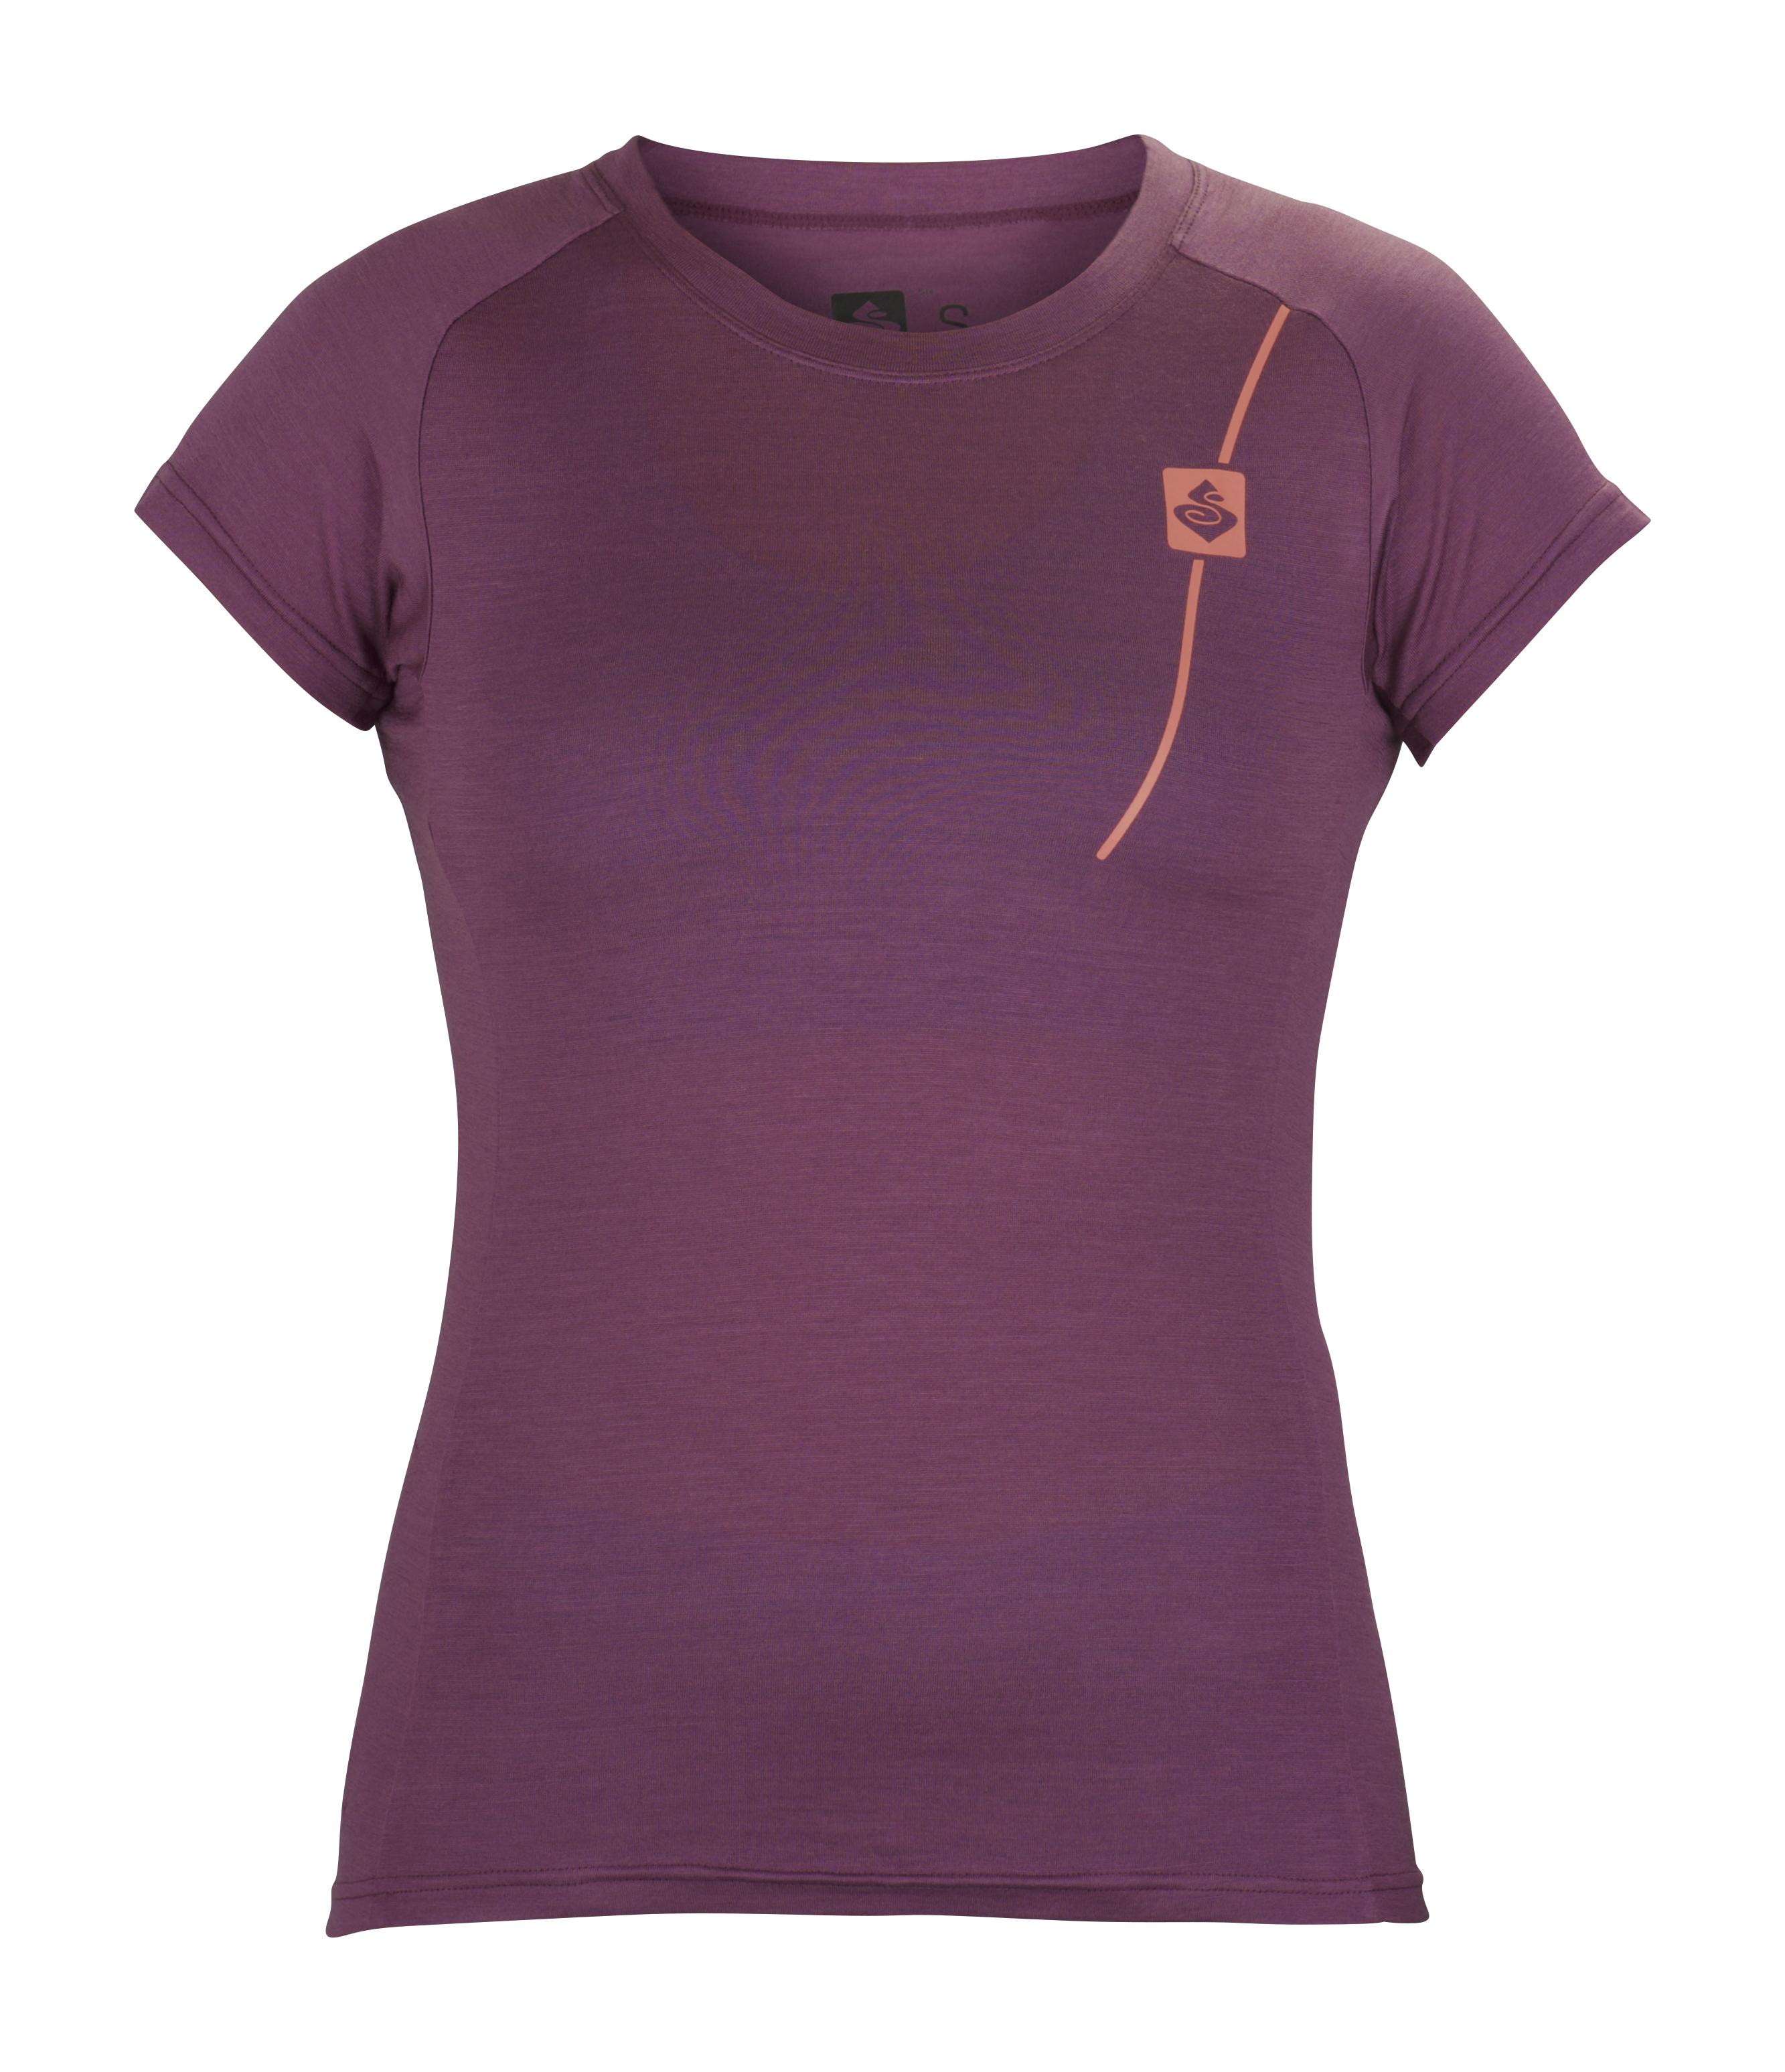 828044-badlands Merino_ss_jersey_wmns-vibrant_violet-front.jpg